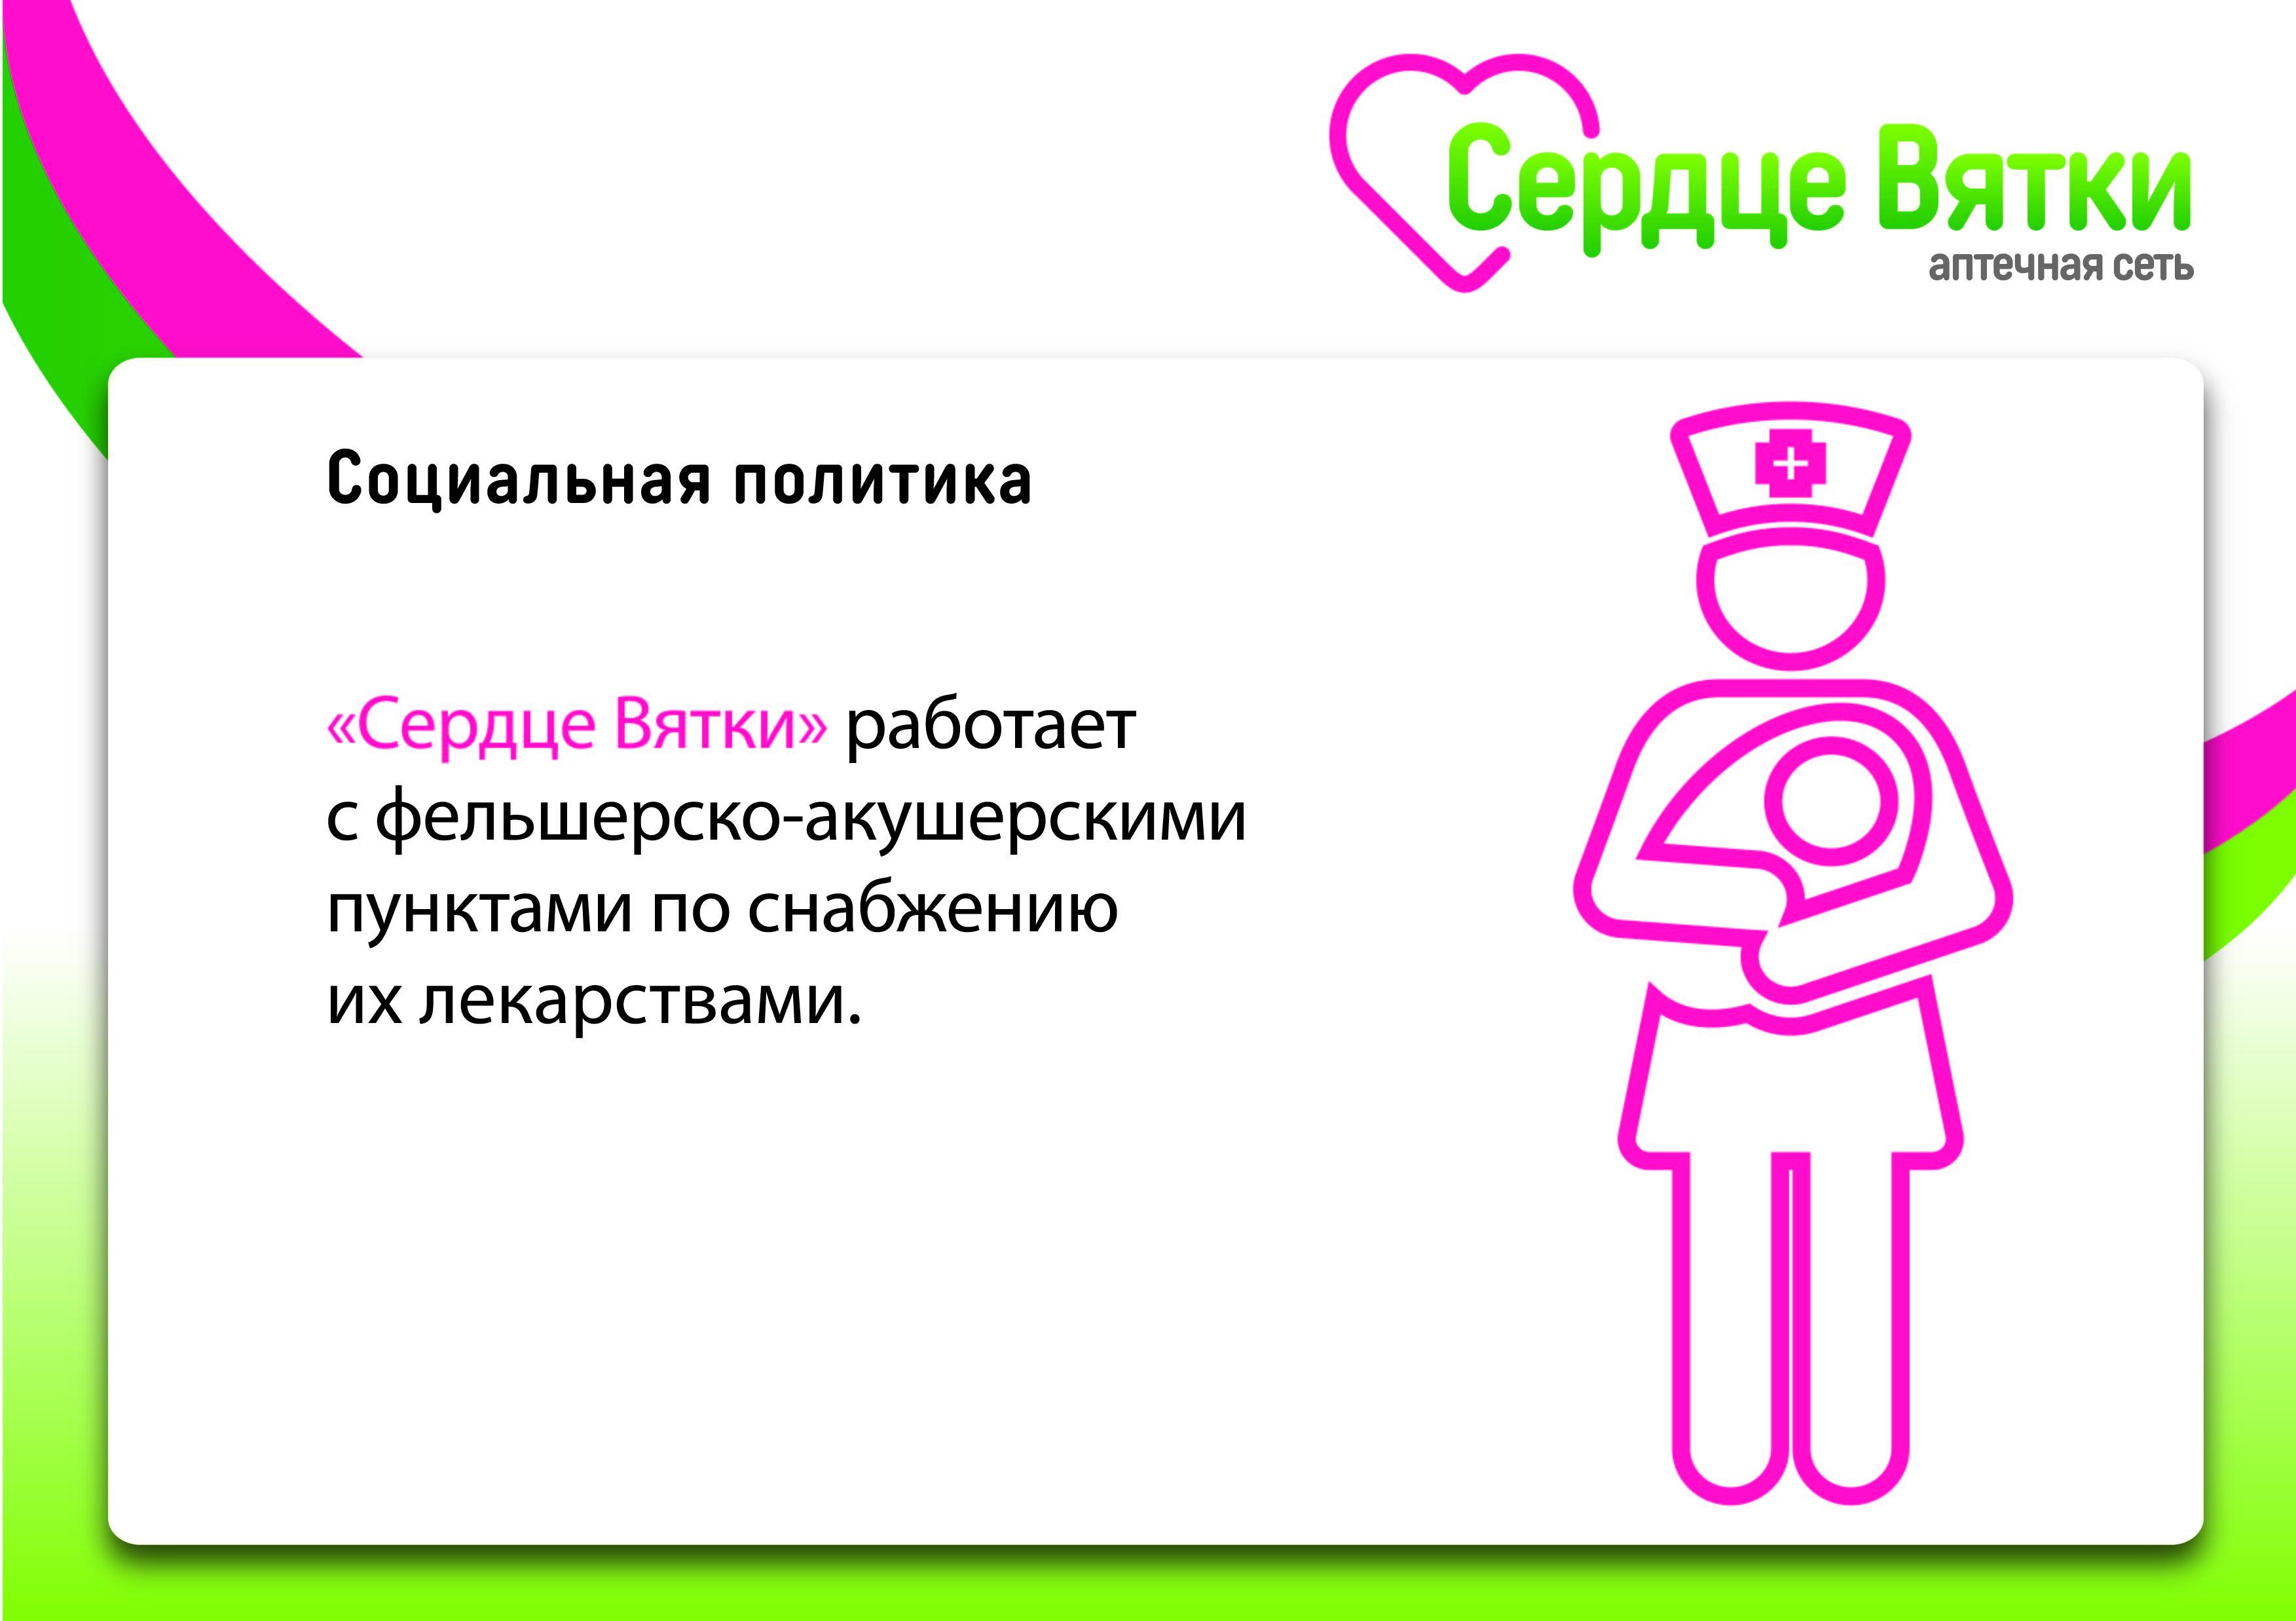 Сердце Вятки презентация_Page_24